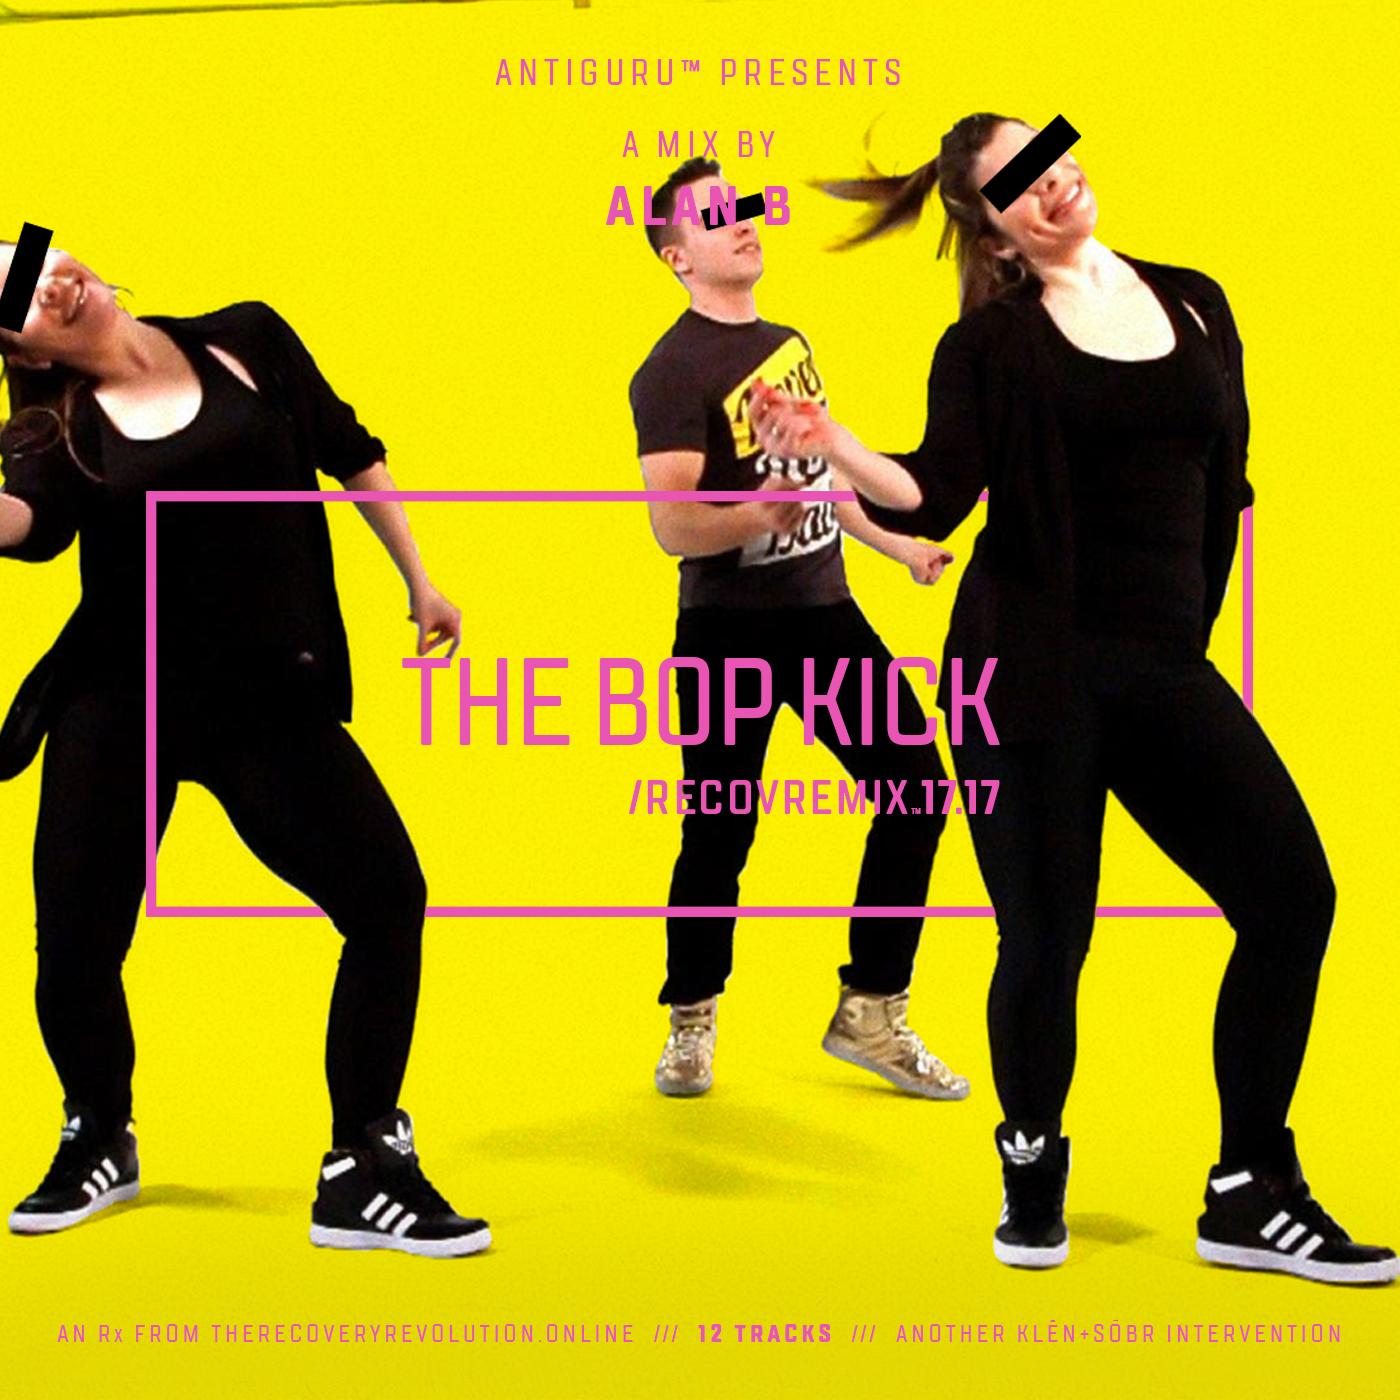 recovremix1717-the-bop-kick.jpg